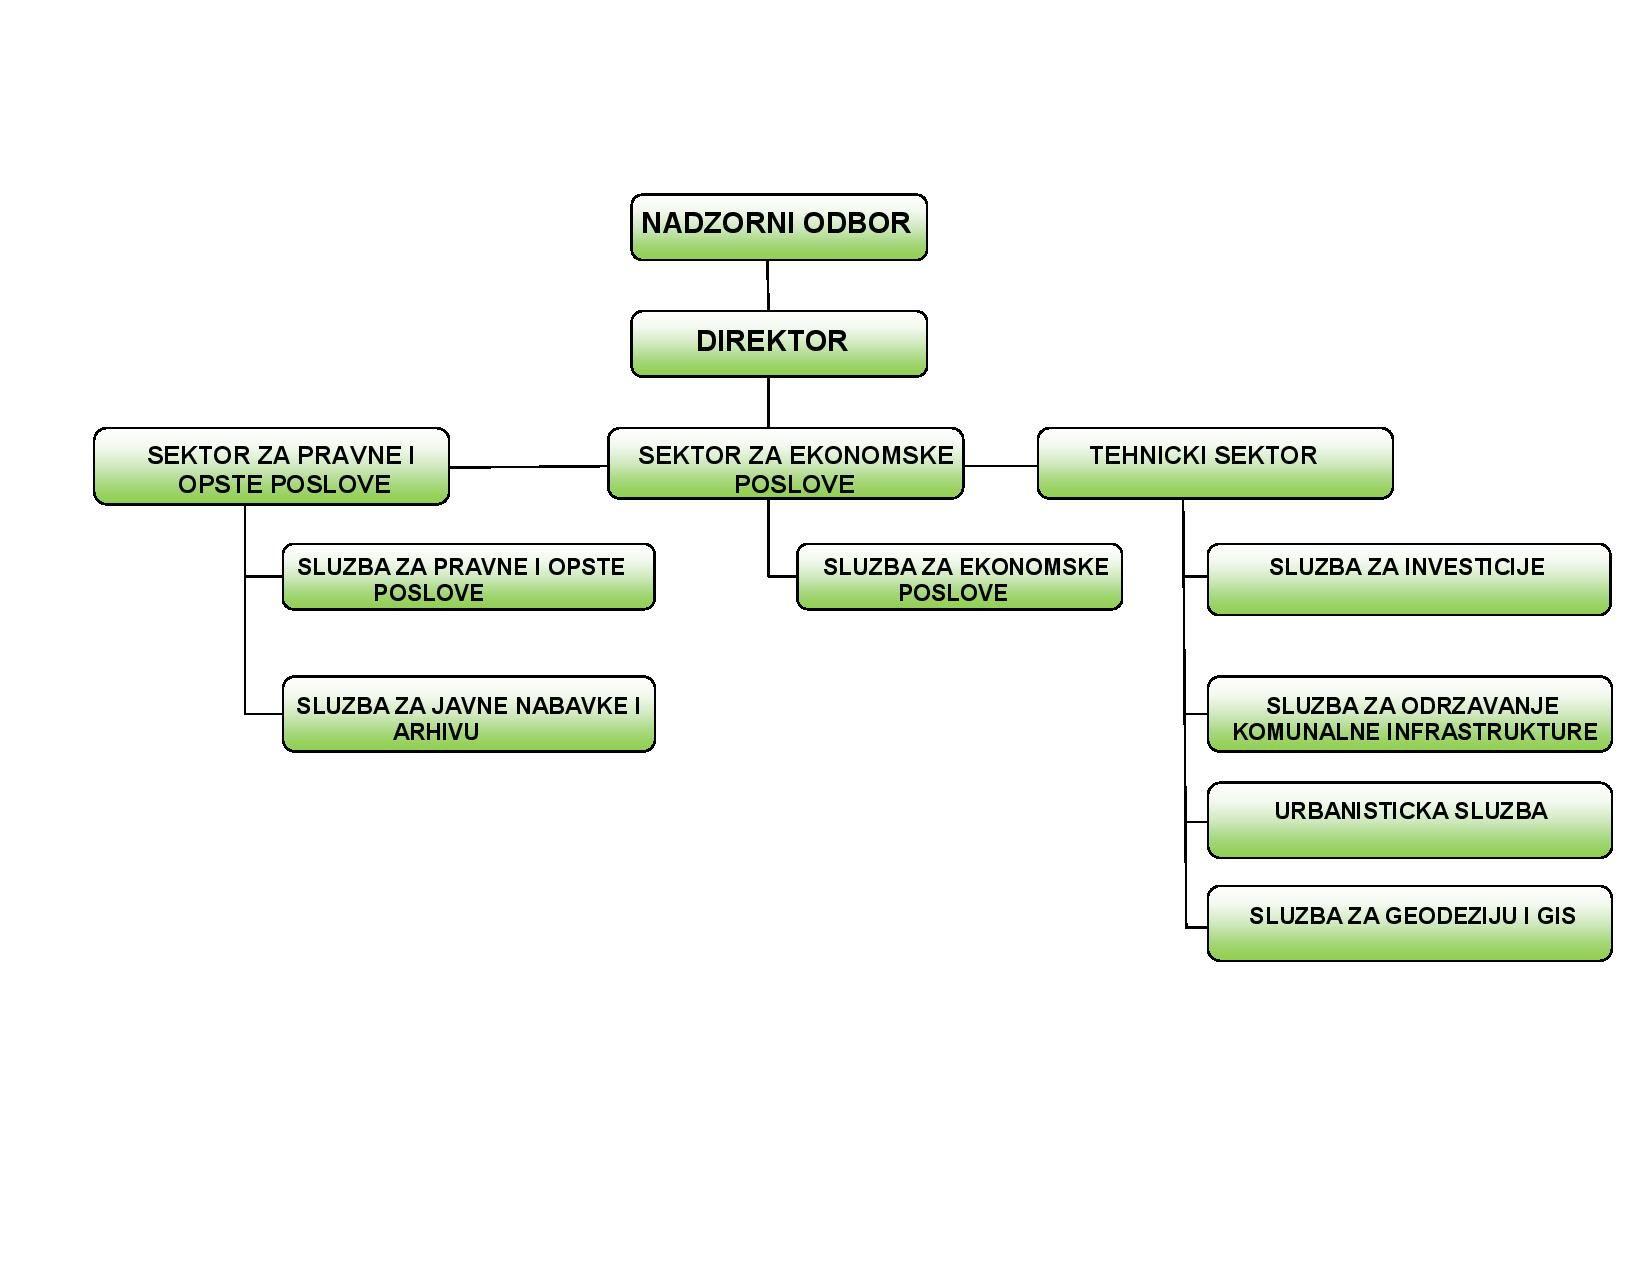 organizaciona struktura preduzeca